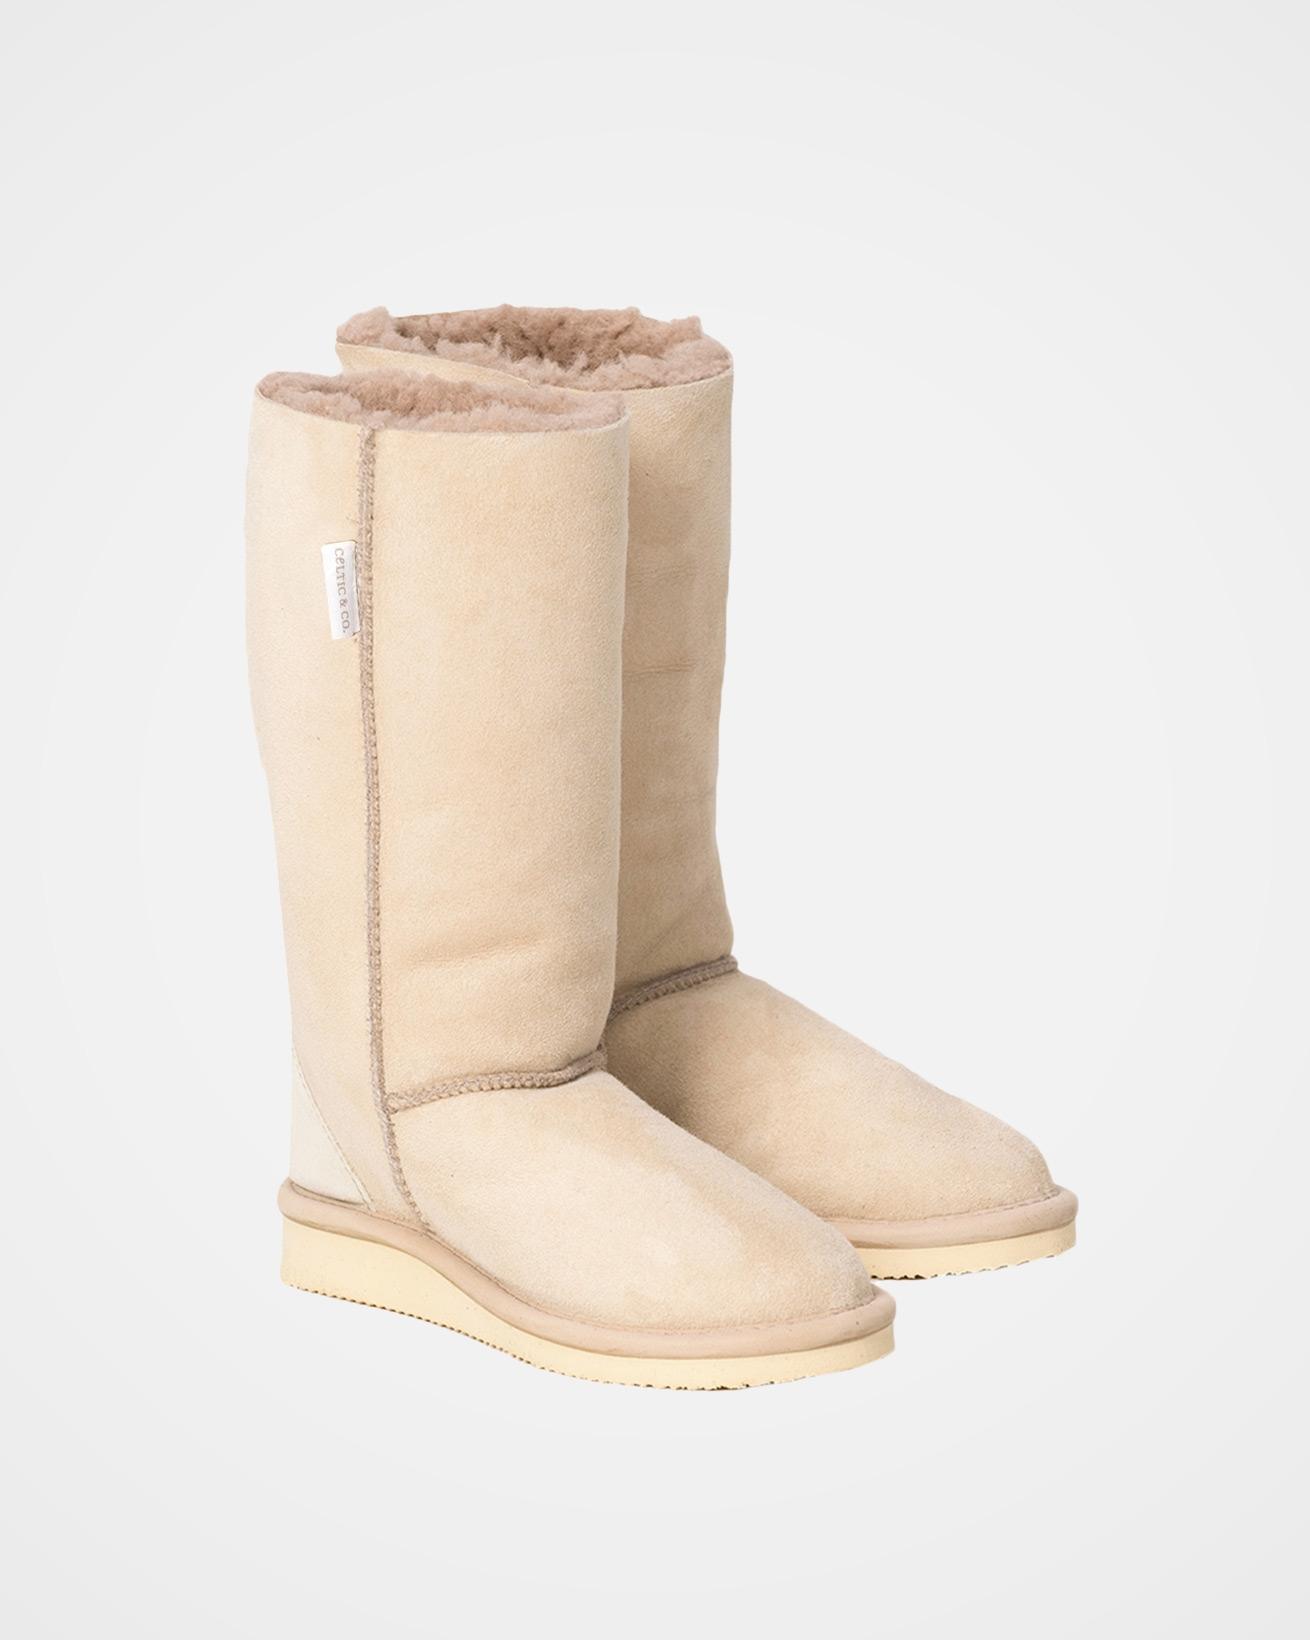 House Boot Calf - Size 6 - Oatmeal - 2021